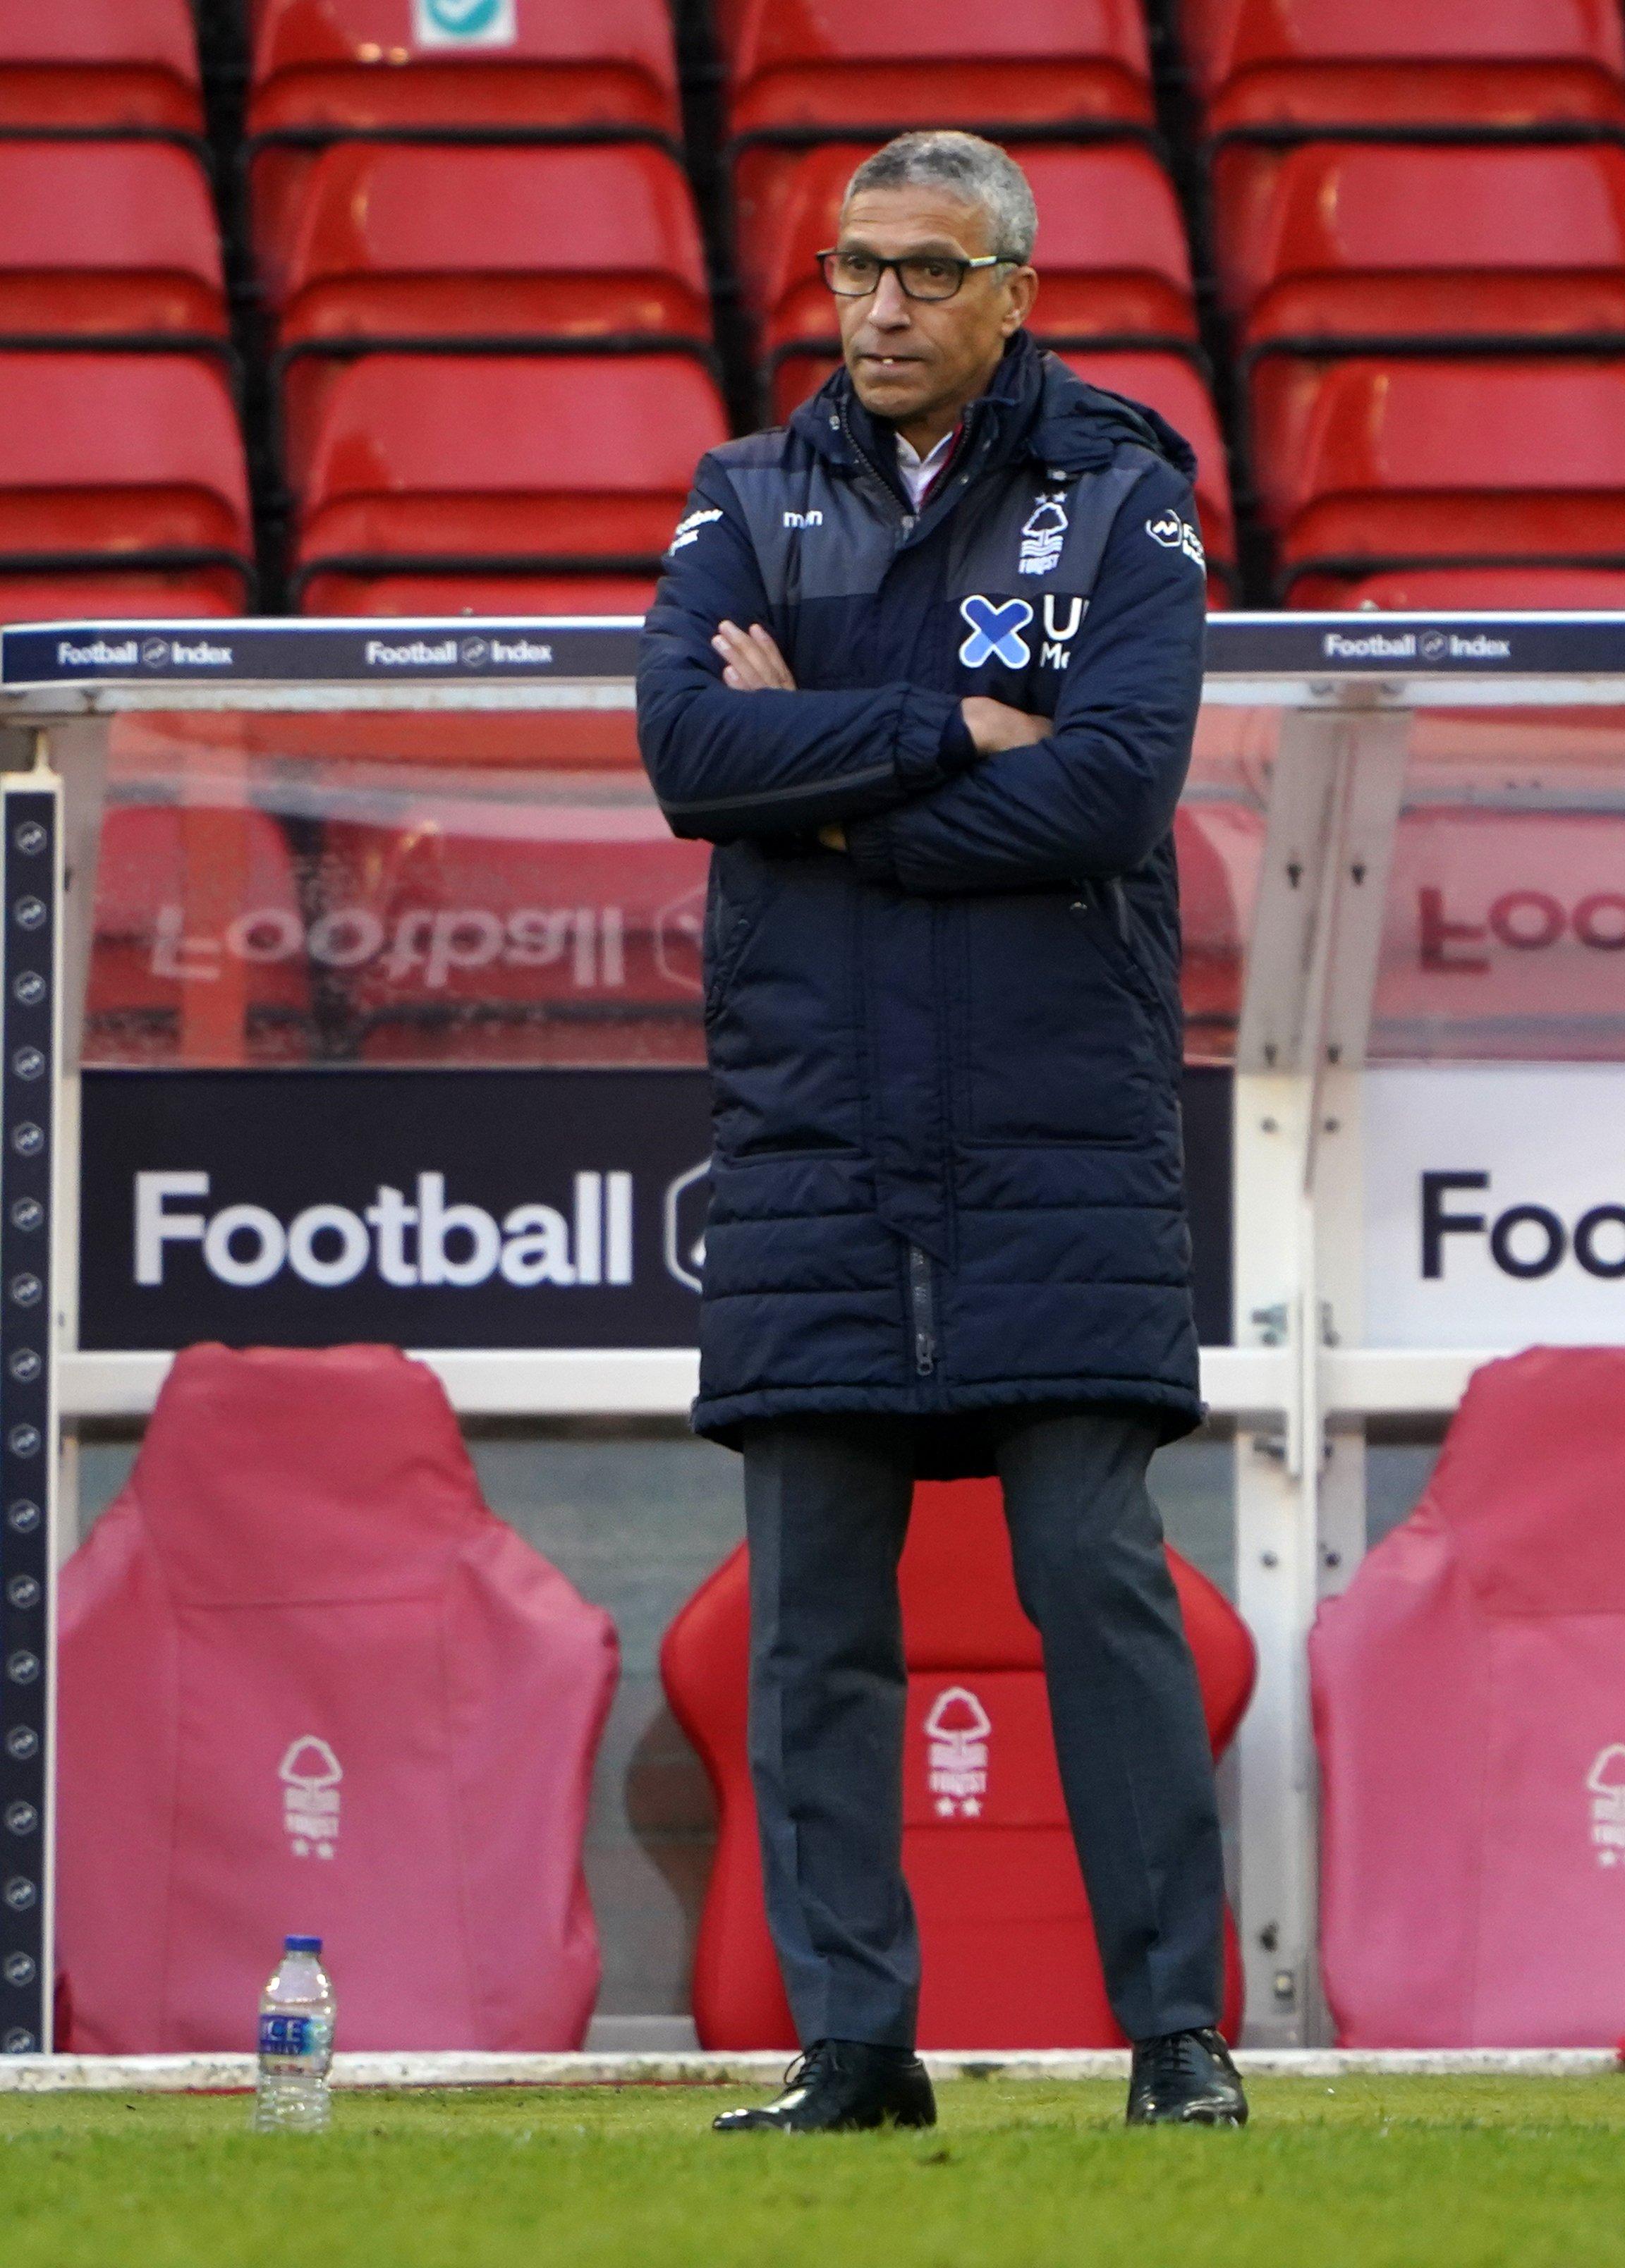 Nottingham Forest boss Chris Hughton has plenty of options at his disposal